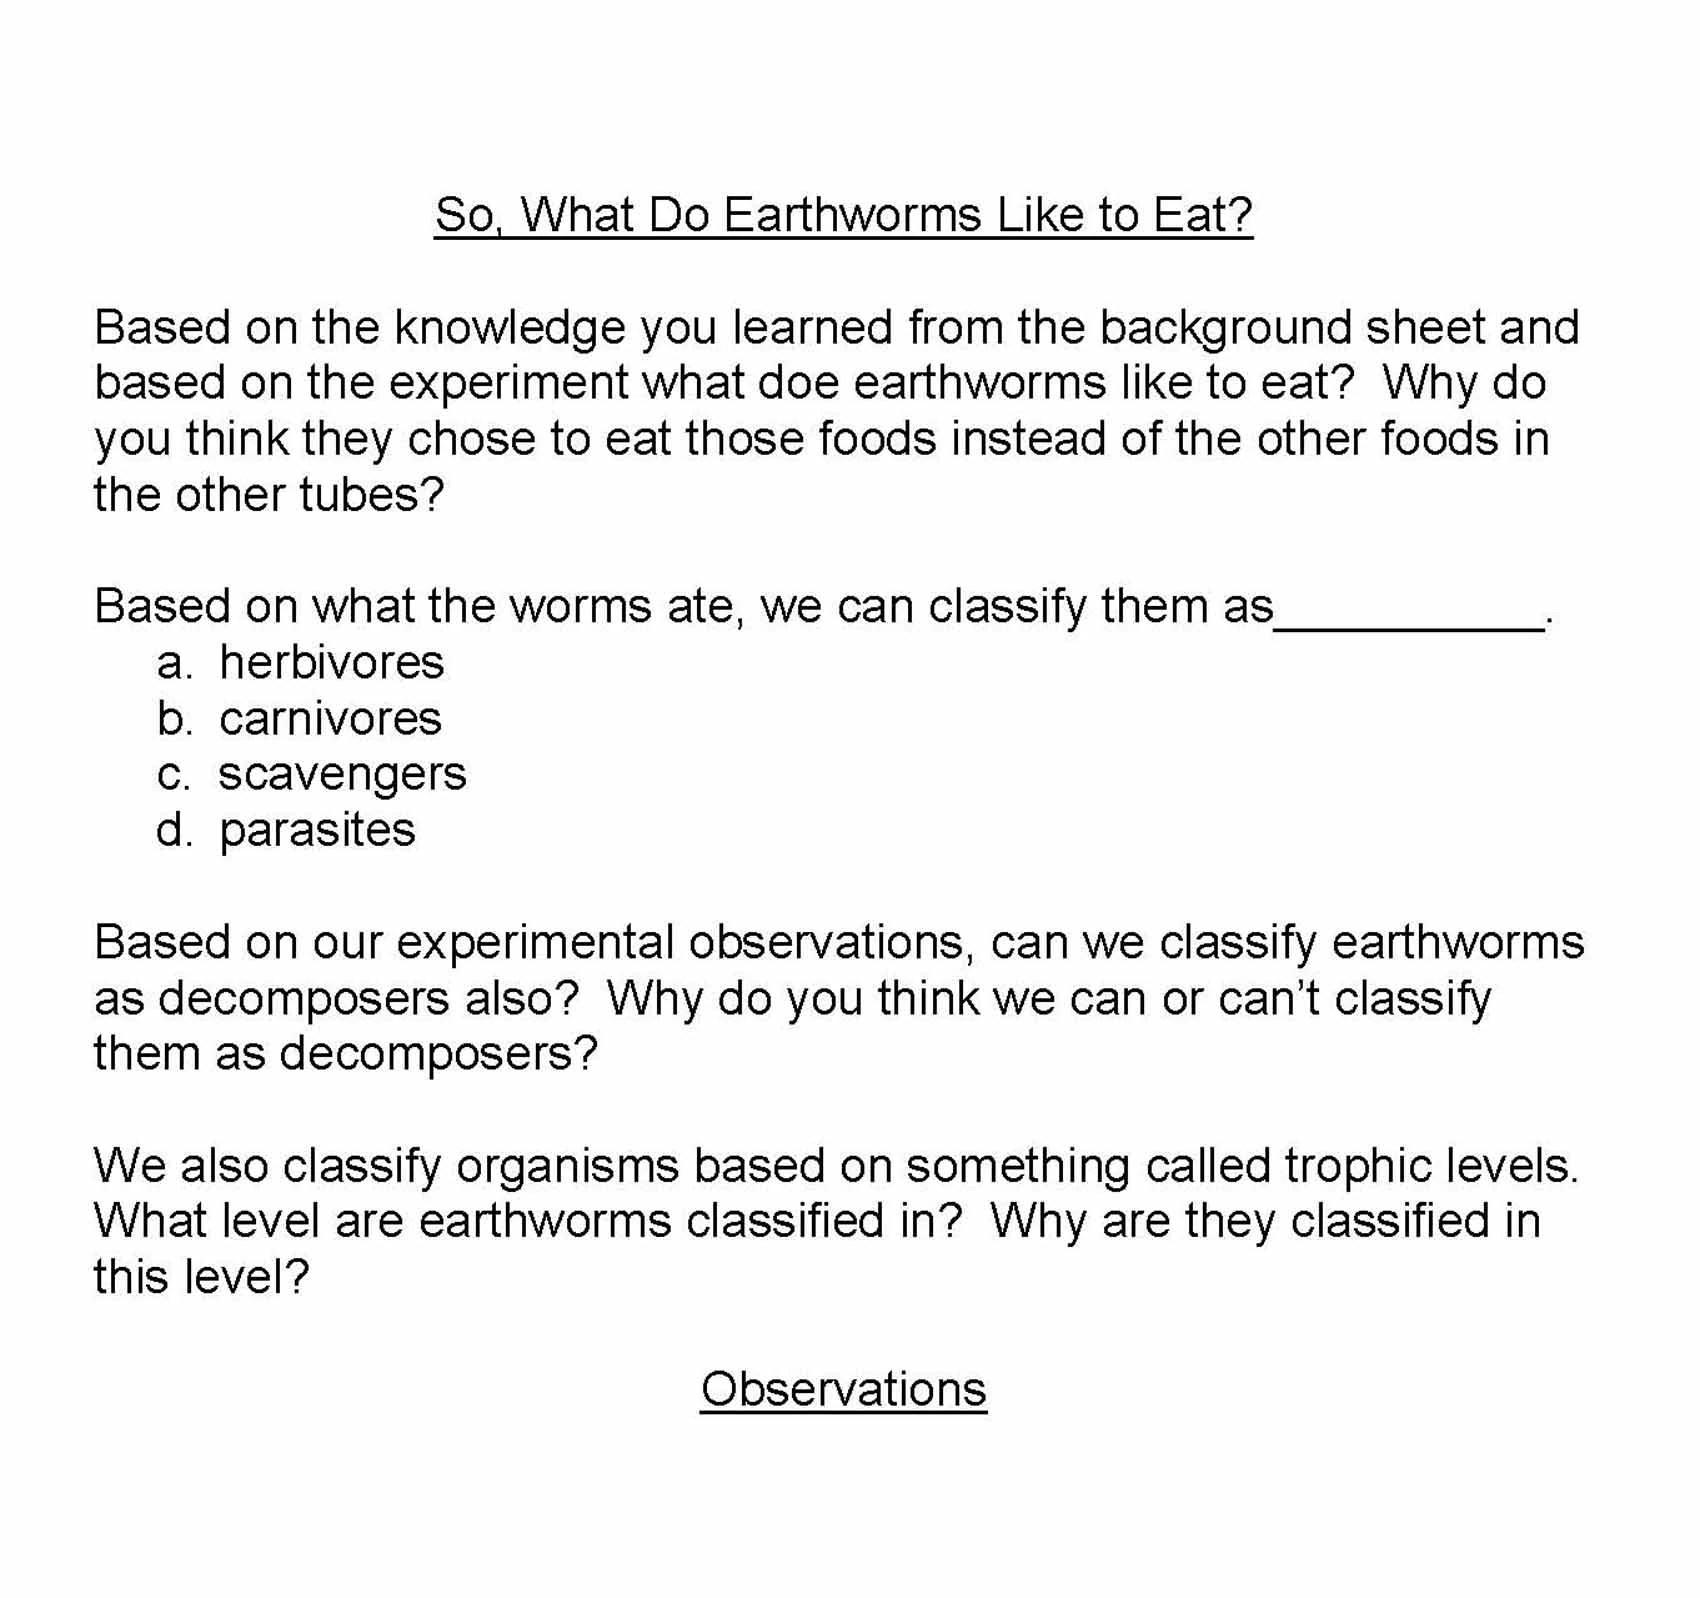 Earthworm Ecosystems What Do Earthworms Like To Eat